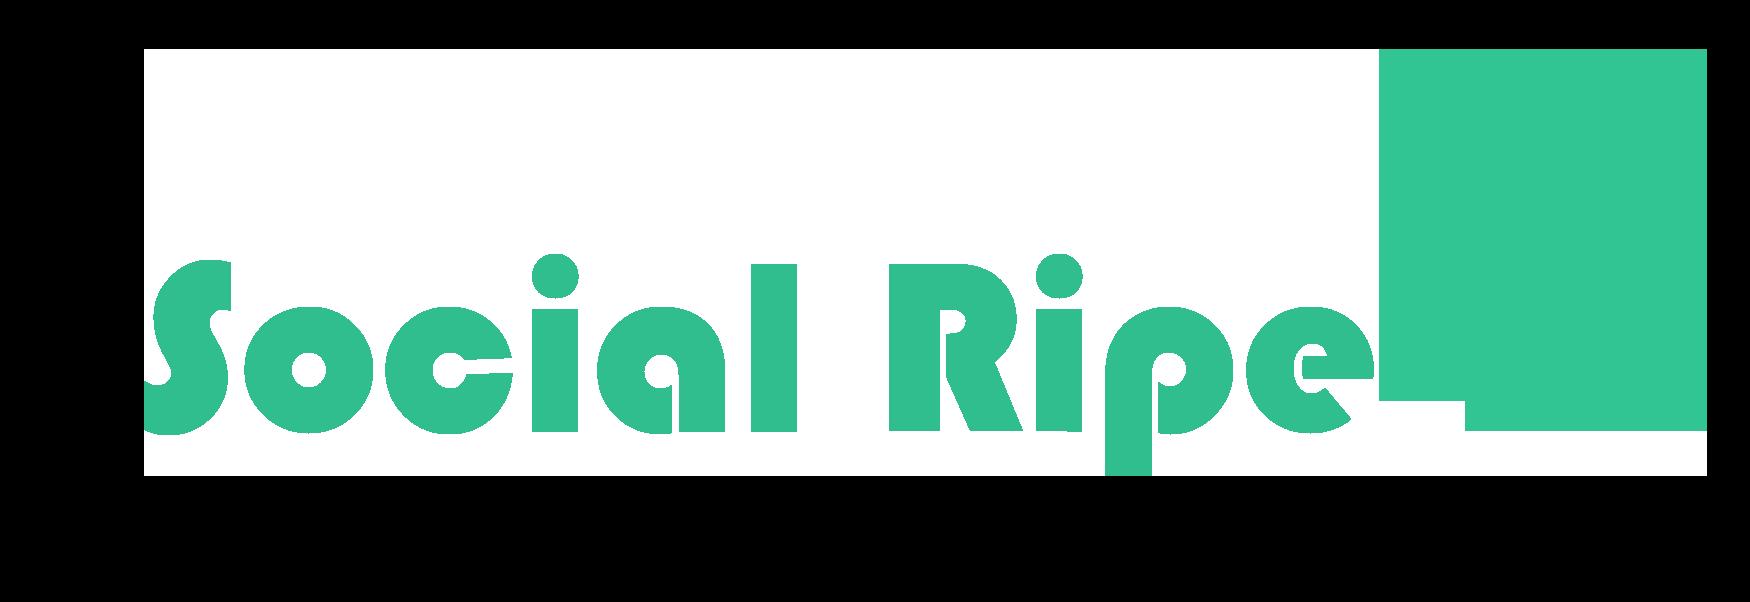 social-ripe